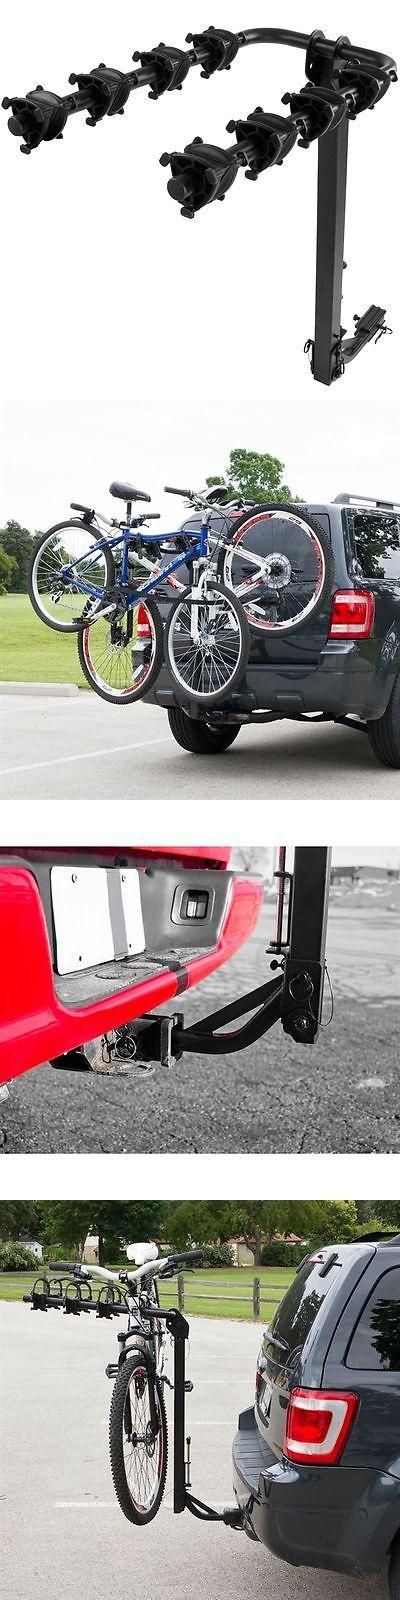 Car and Truck Racks 177849: 4-Bike Hitch Mounted Bike Carrier Rack Class Ii, Iii, Iv -> BUY IT NOW ONLY: $114.99 on eBay!